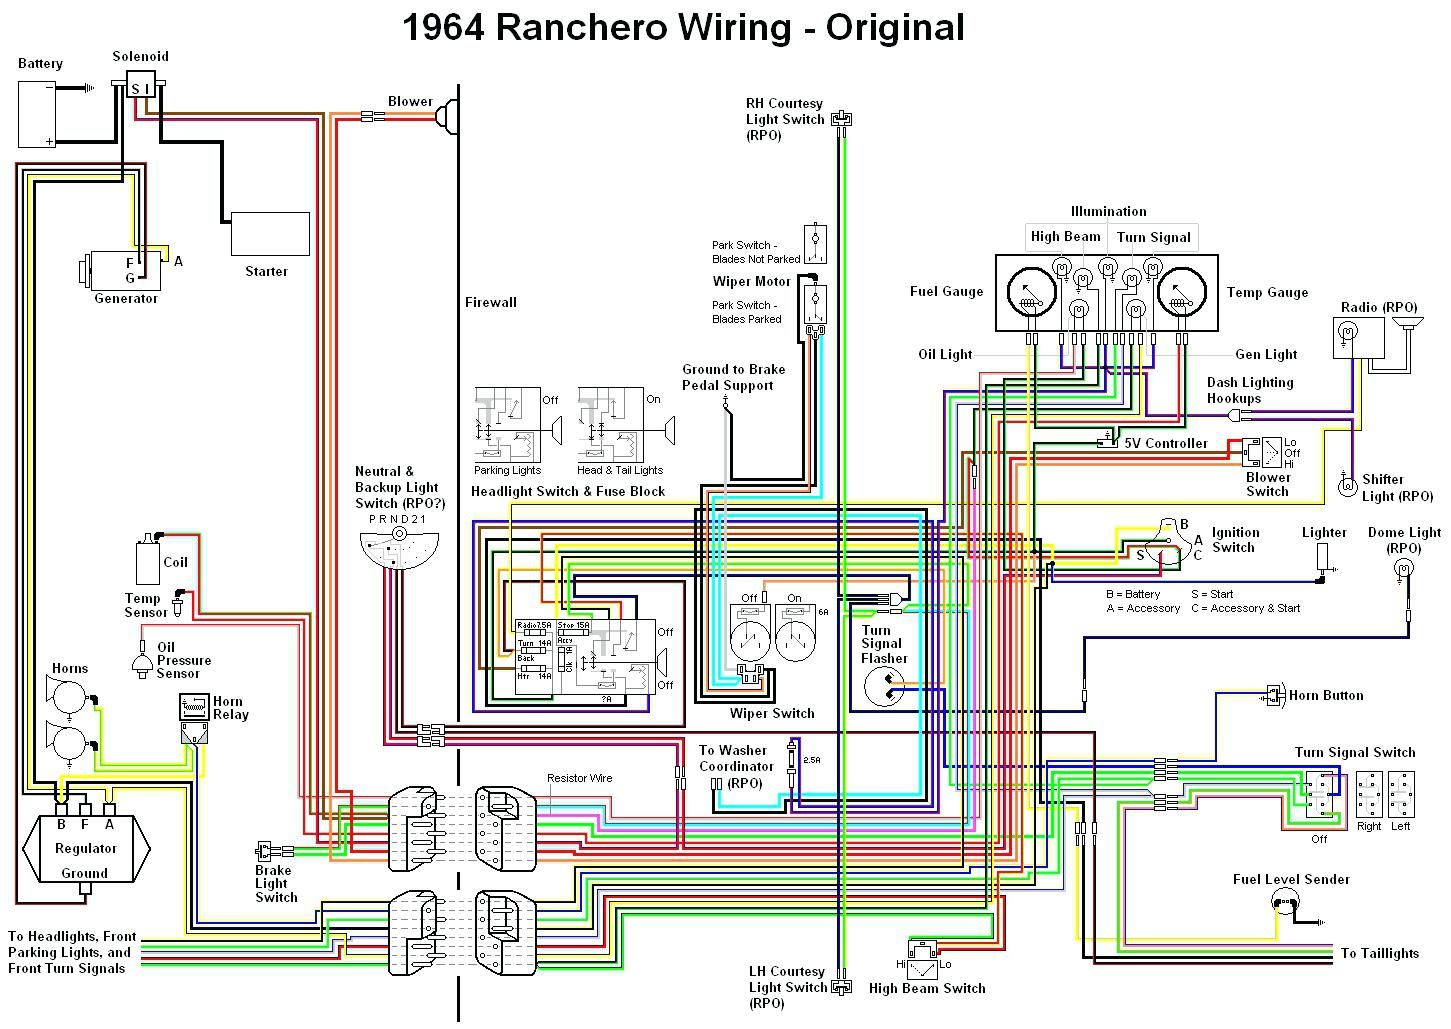 ford ba ute wiring diagram wiring diagram load ford xh ute wiring diagram [ 1451 x 1029 Pixel ]